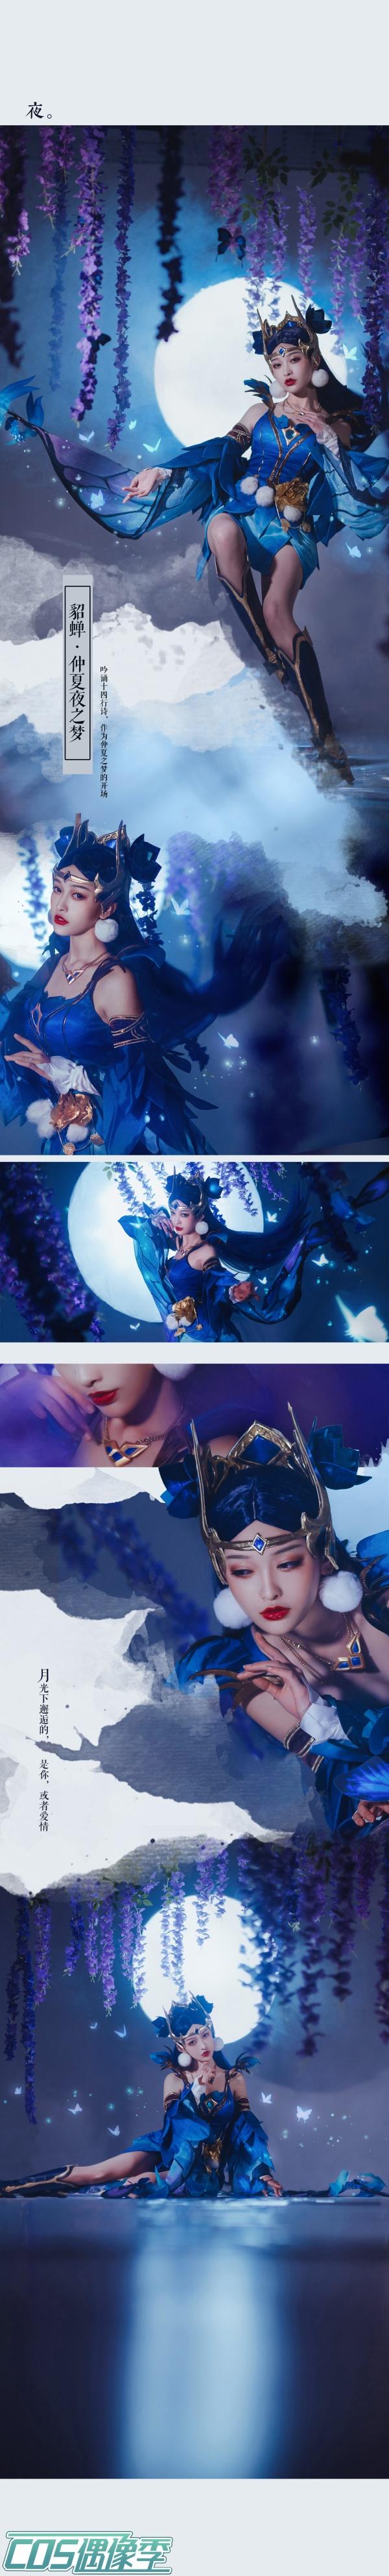 cf穿越火线搞笑视频_cosplay:《王者荣耀》貂蝉@岚时鱼九